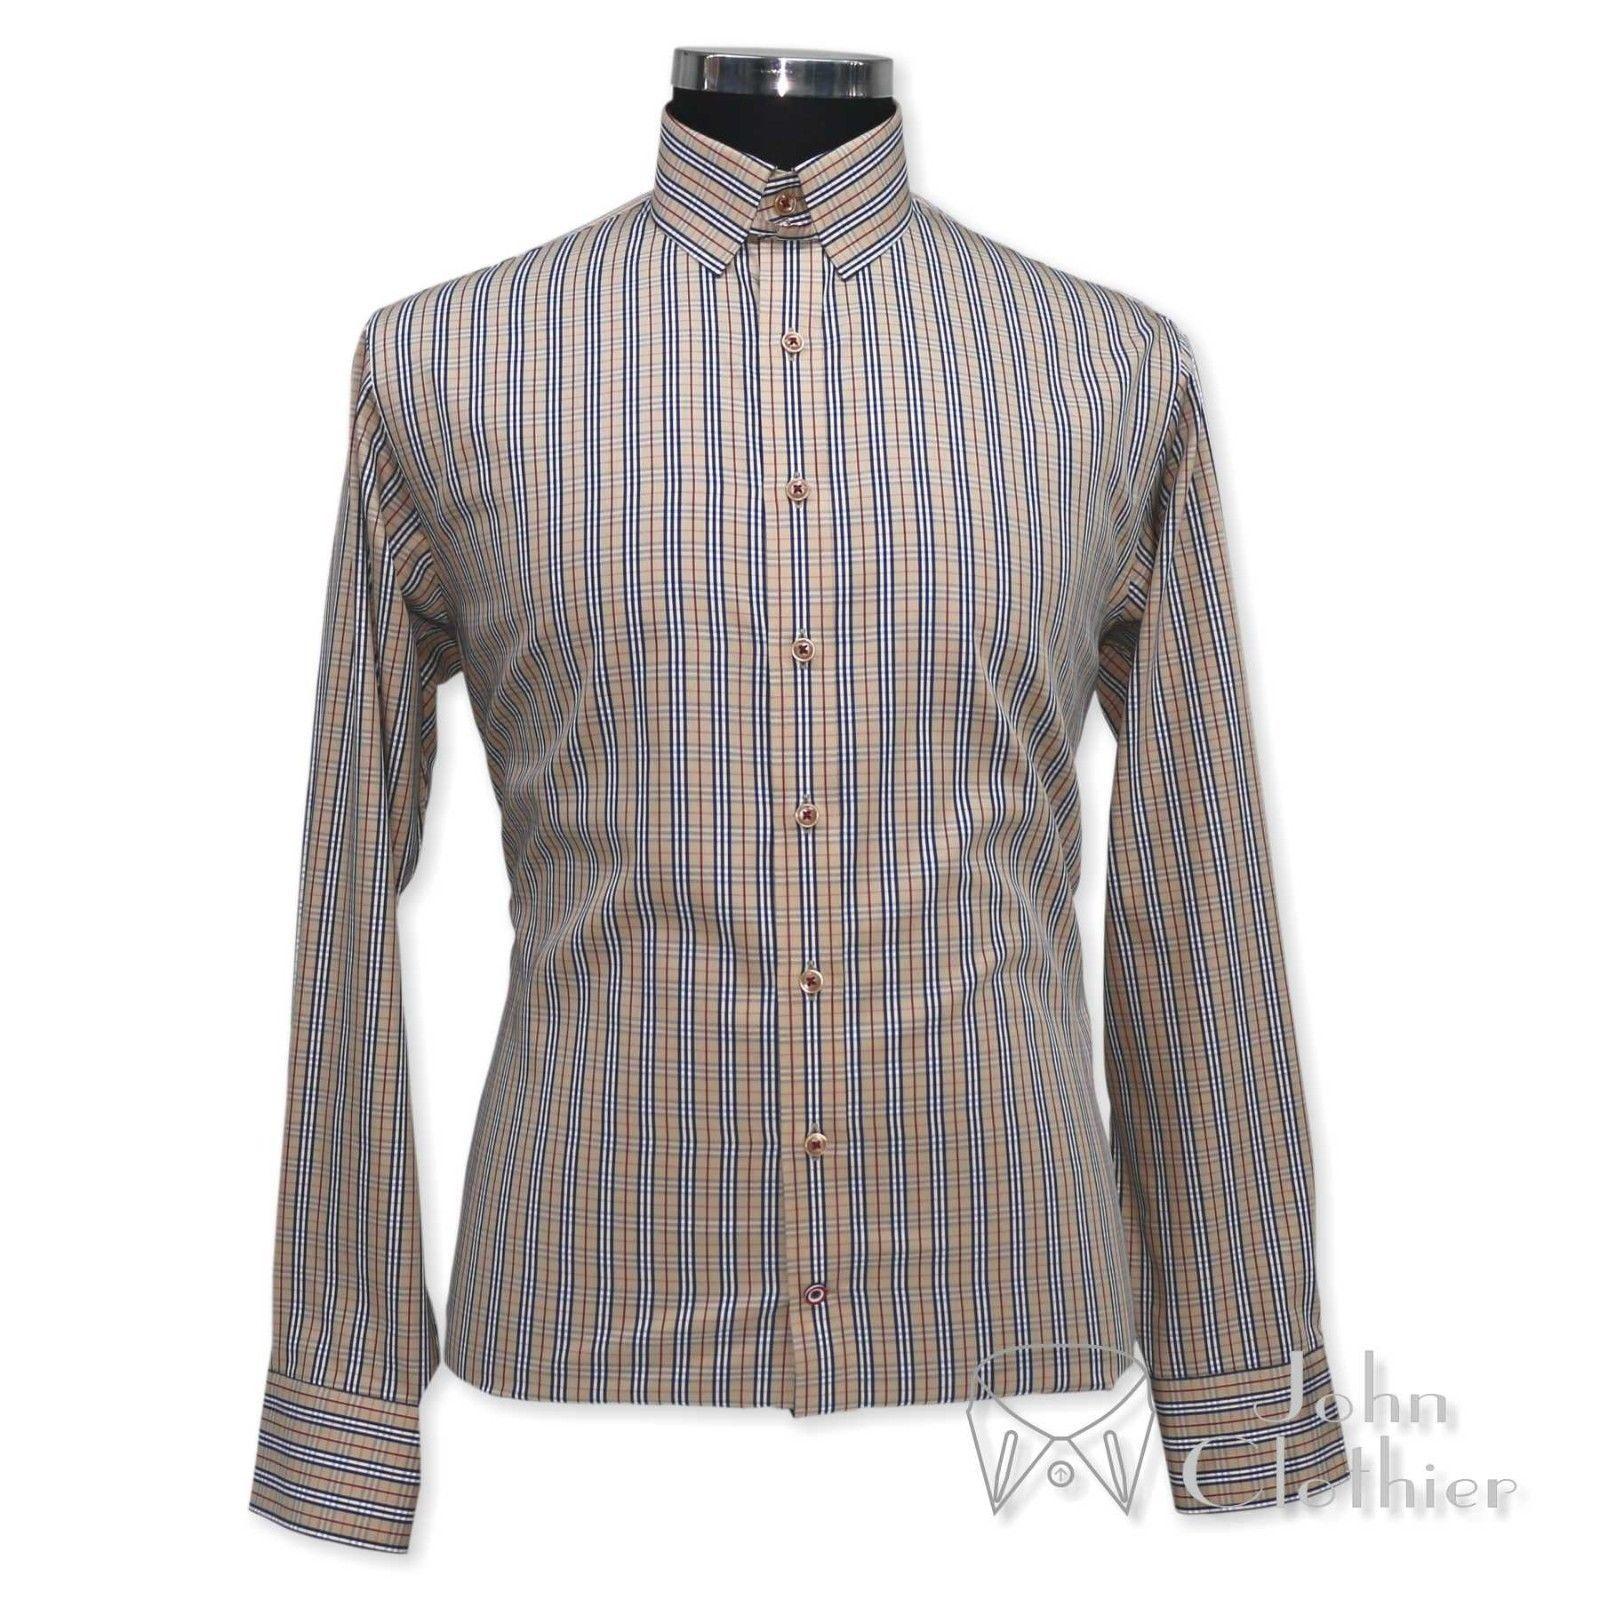 New Mens 100% Cotton shirt Tab collar Brown checks James Bond Loop collar Gents